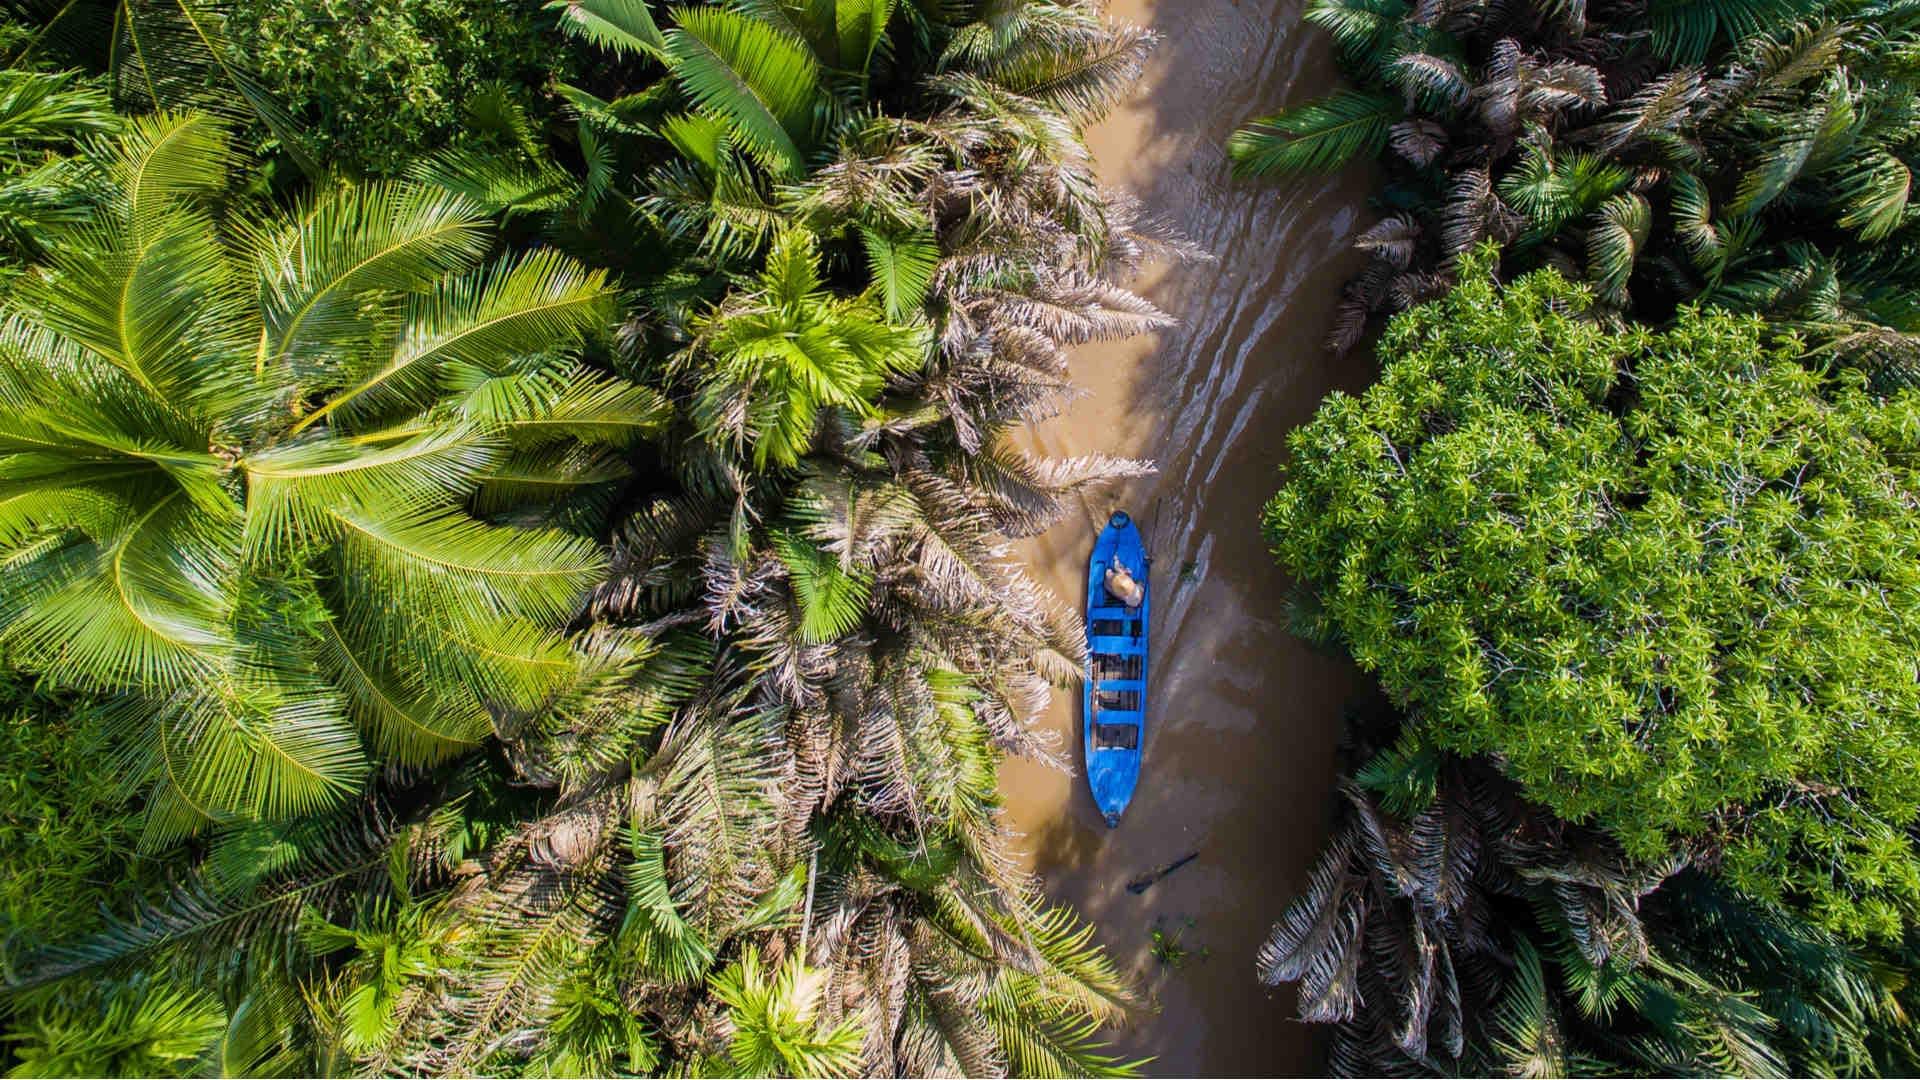 Mekong Delta Fischerboot zwischen Palmen